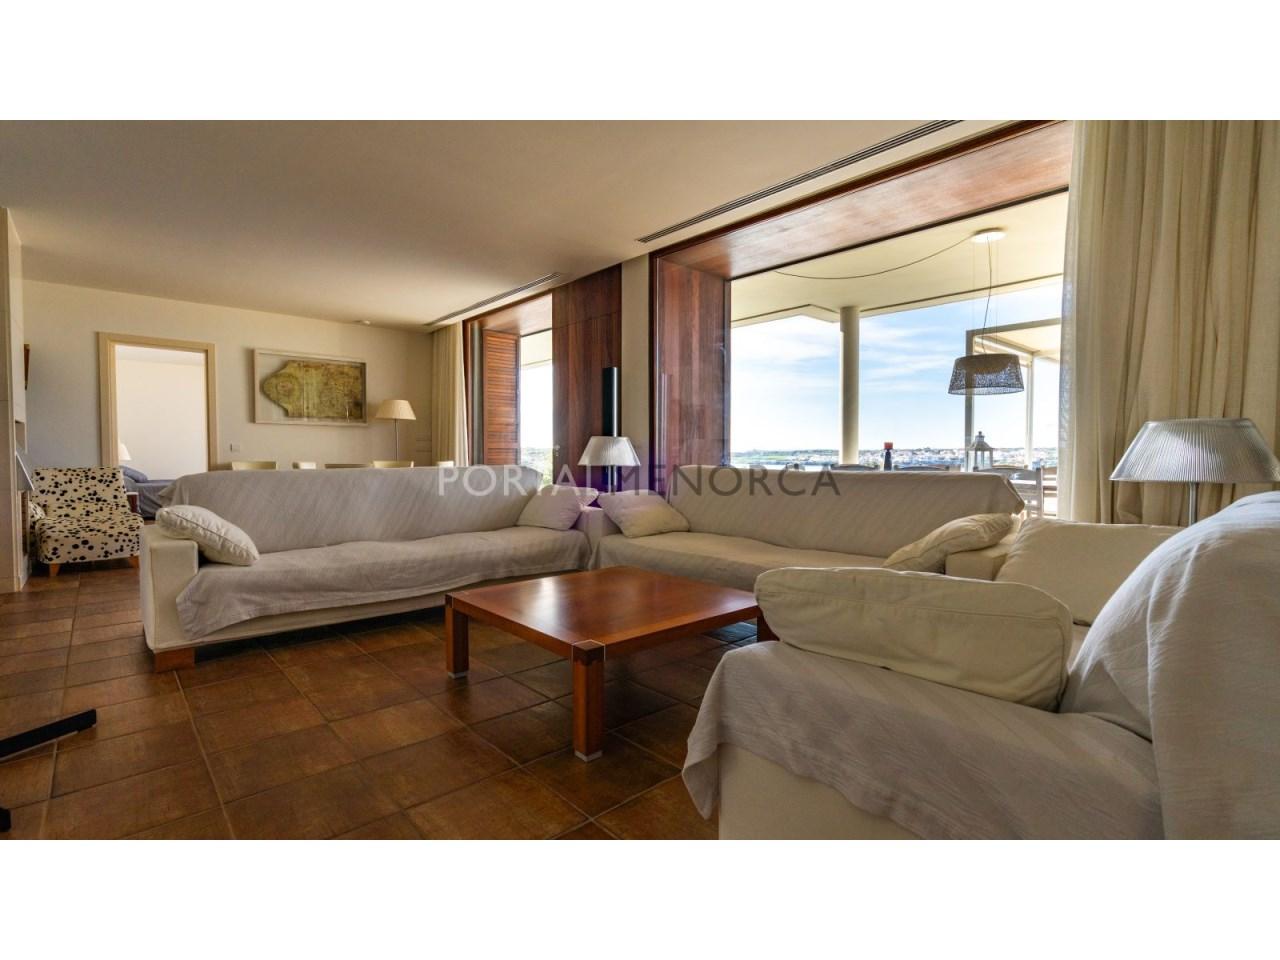 luxe-maison-vendre-acheter-menorca (4)